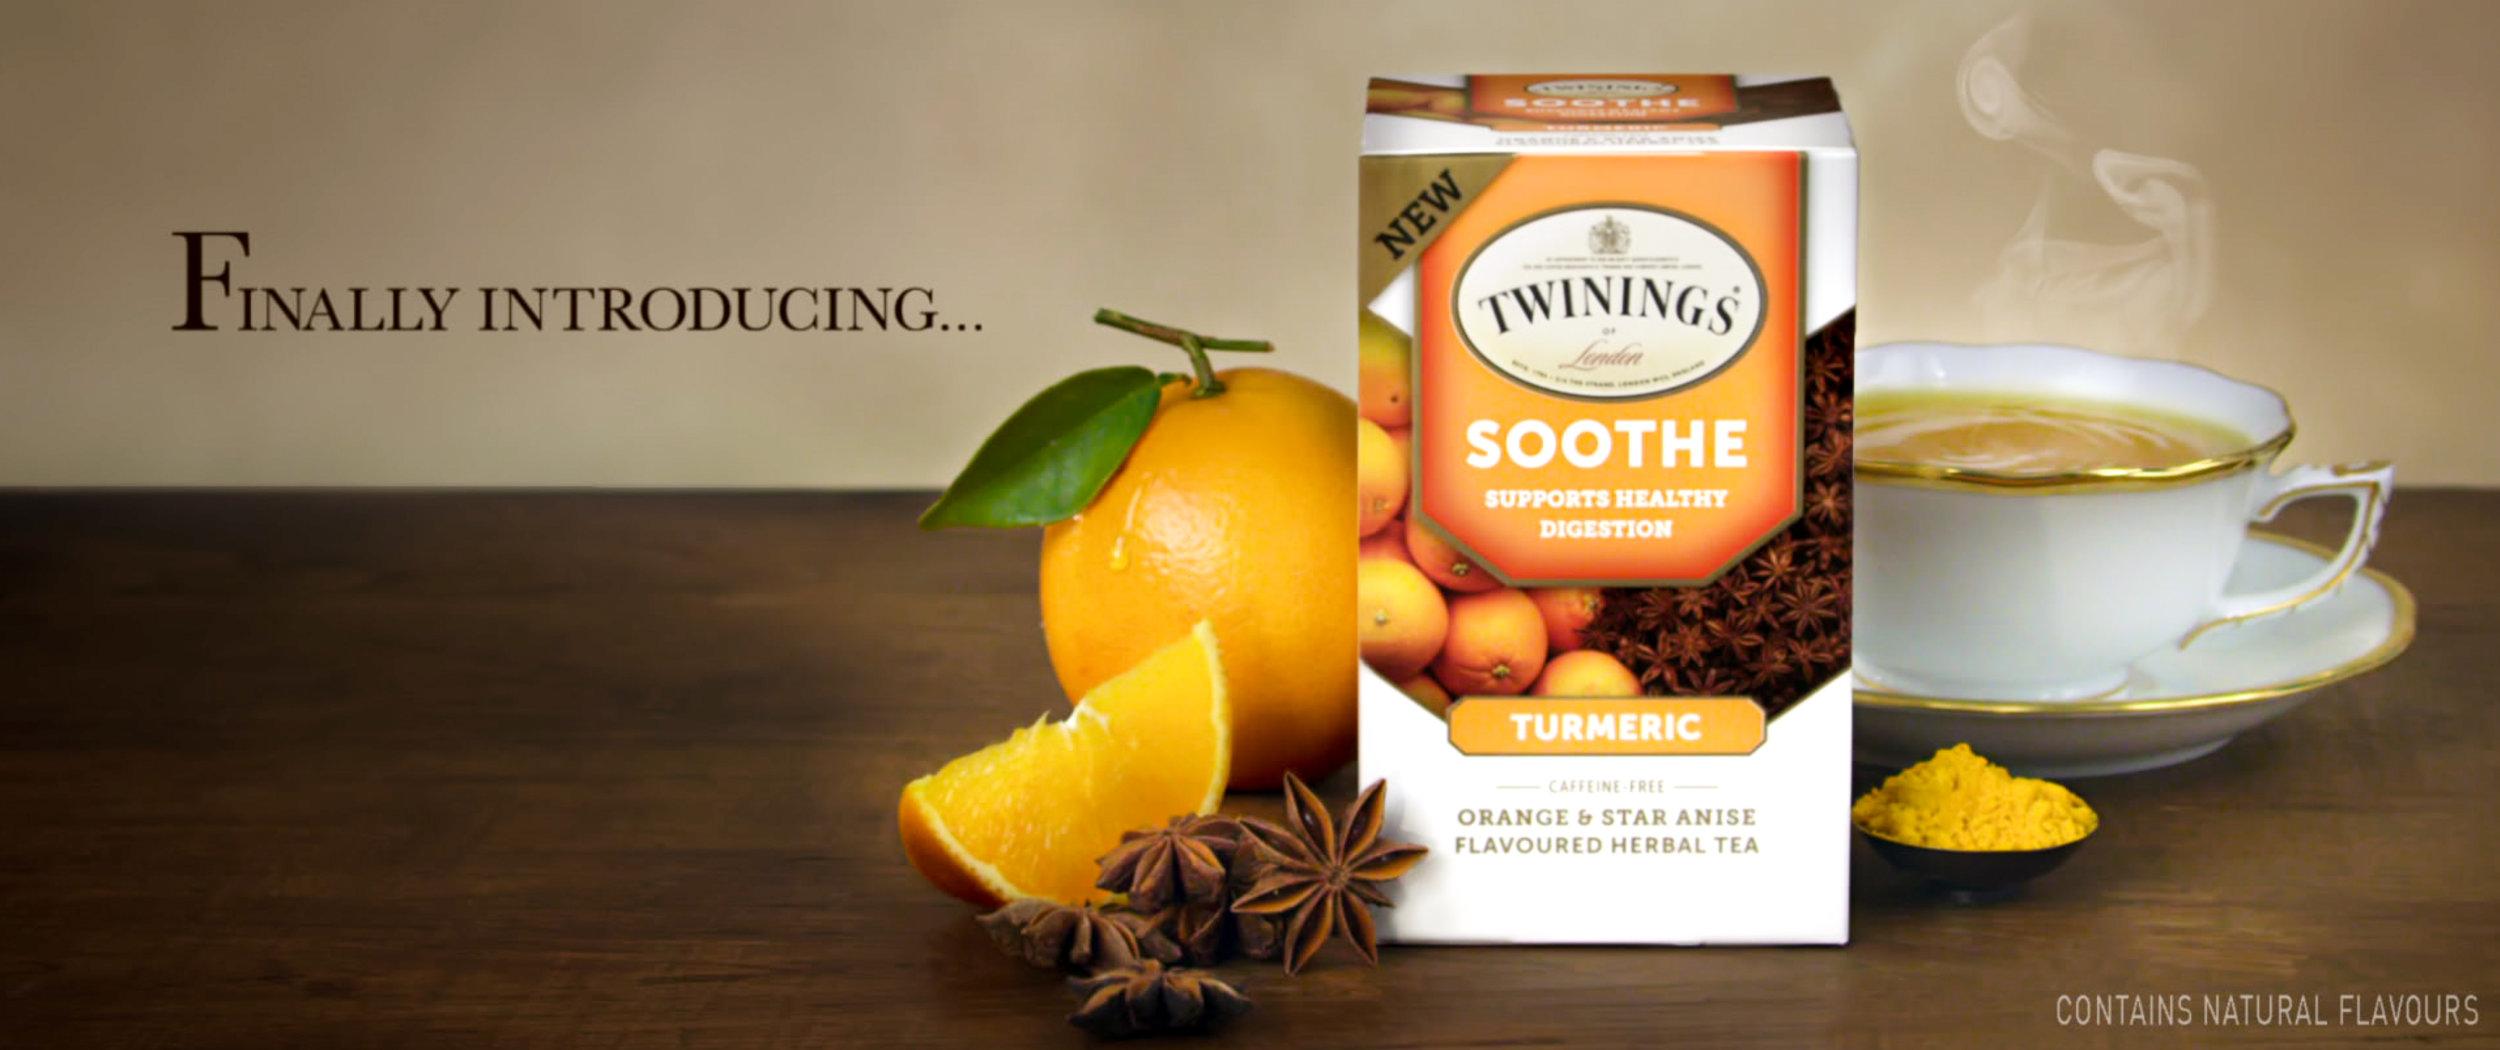 Twinings-3.jpg